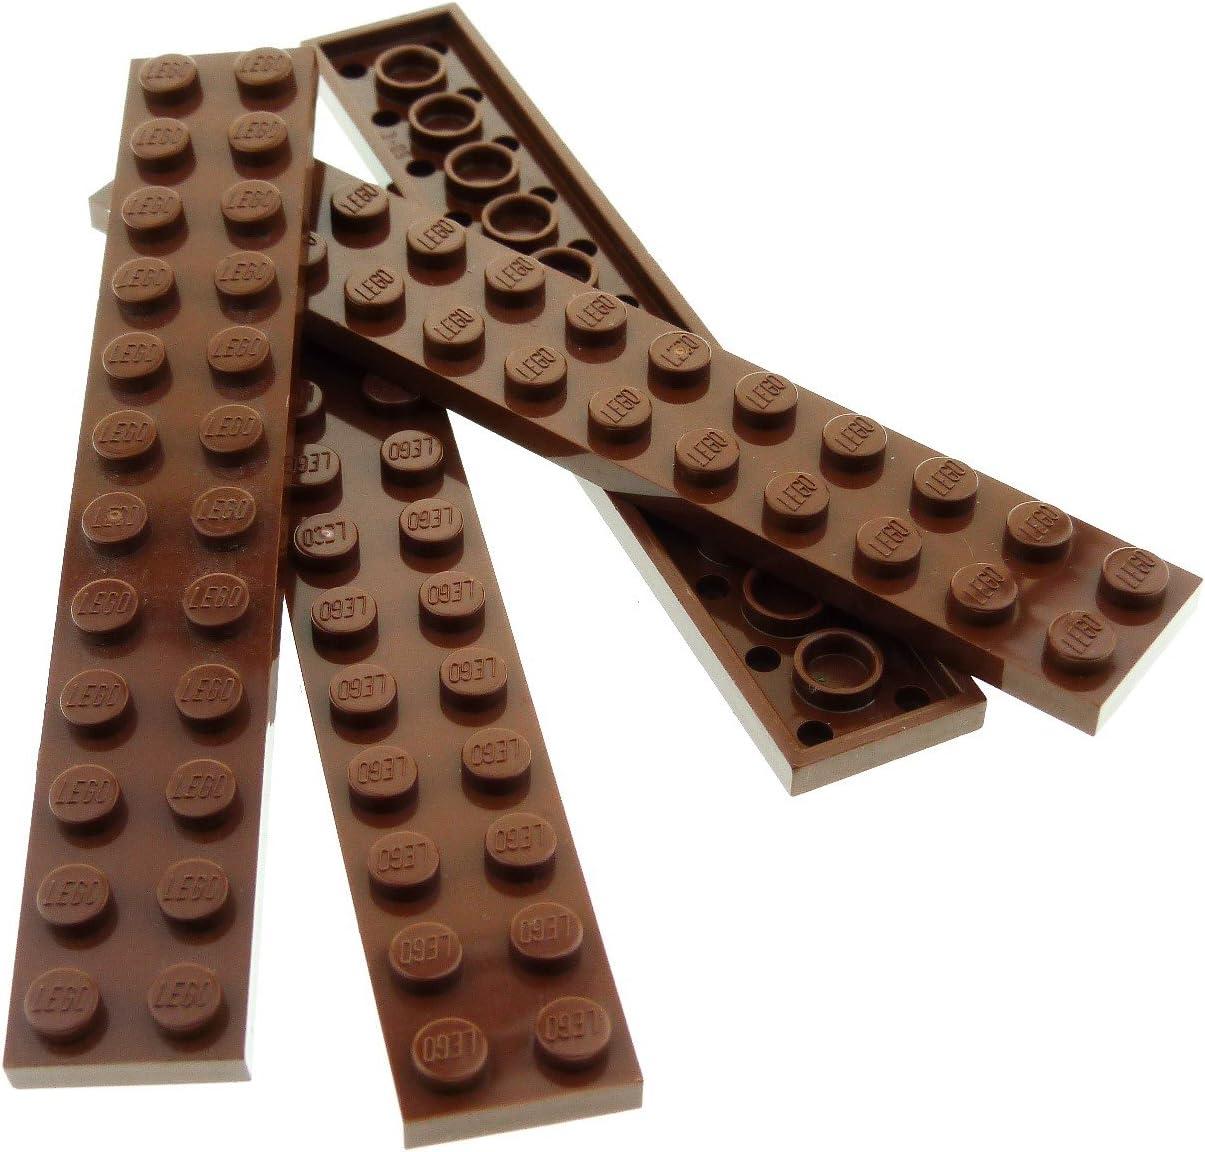 LEGO 8 X PIASTRA bauplatte piatto 2445 NERO 2x12